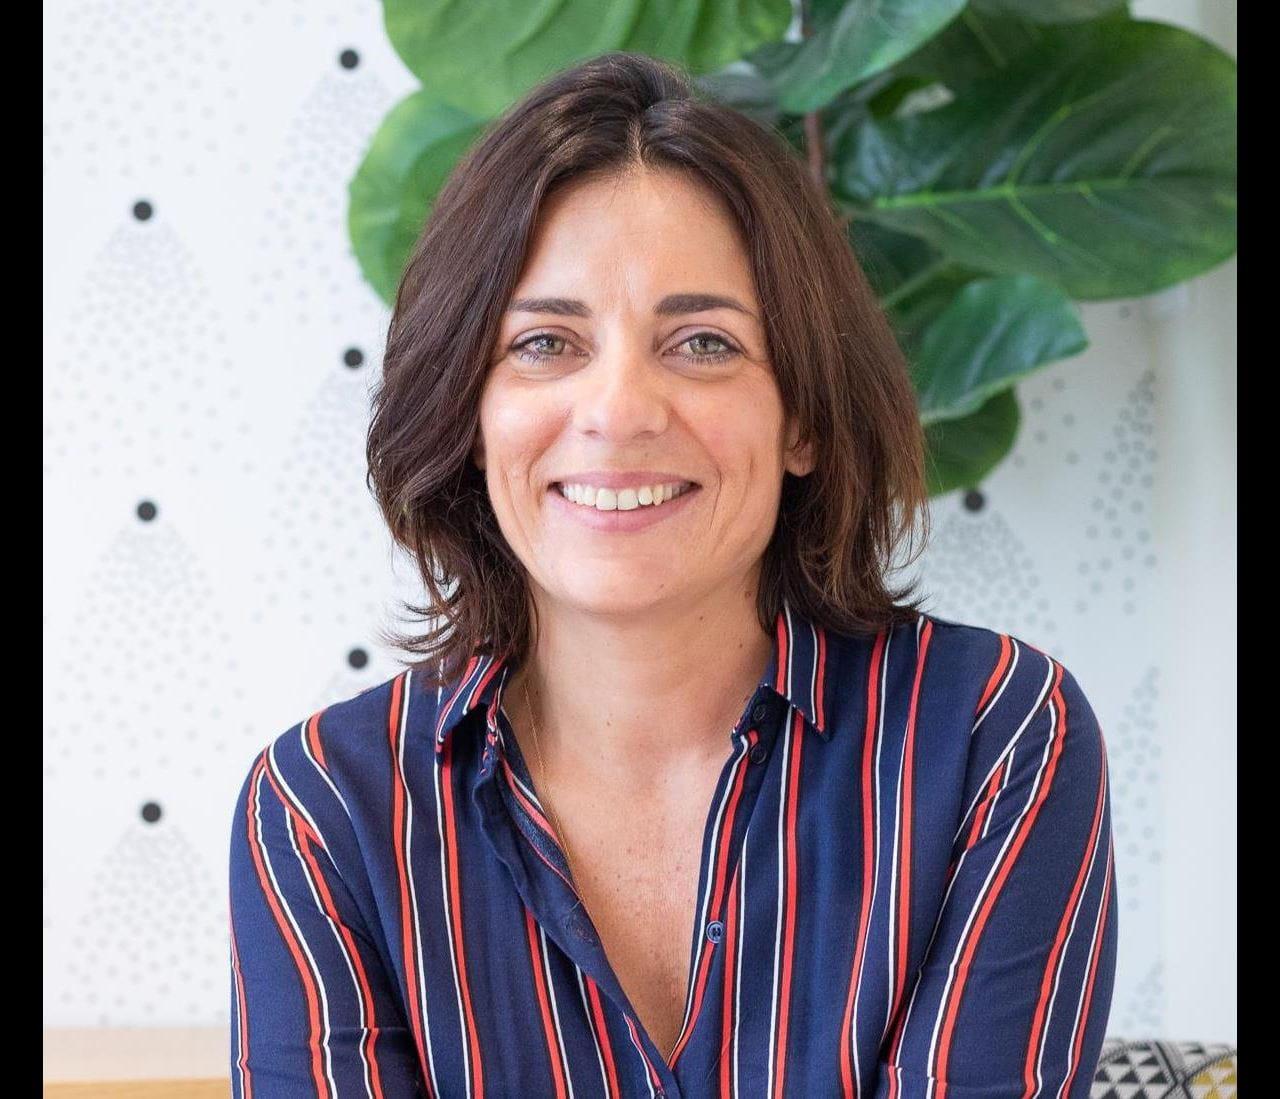 Emilie Rouganne - Directrice Generale d'iProspect France